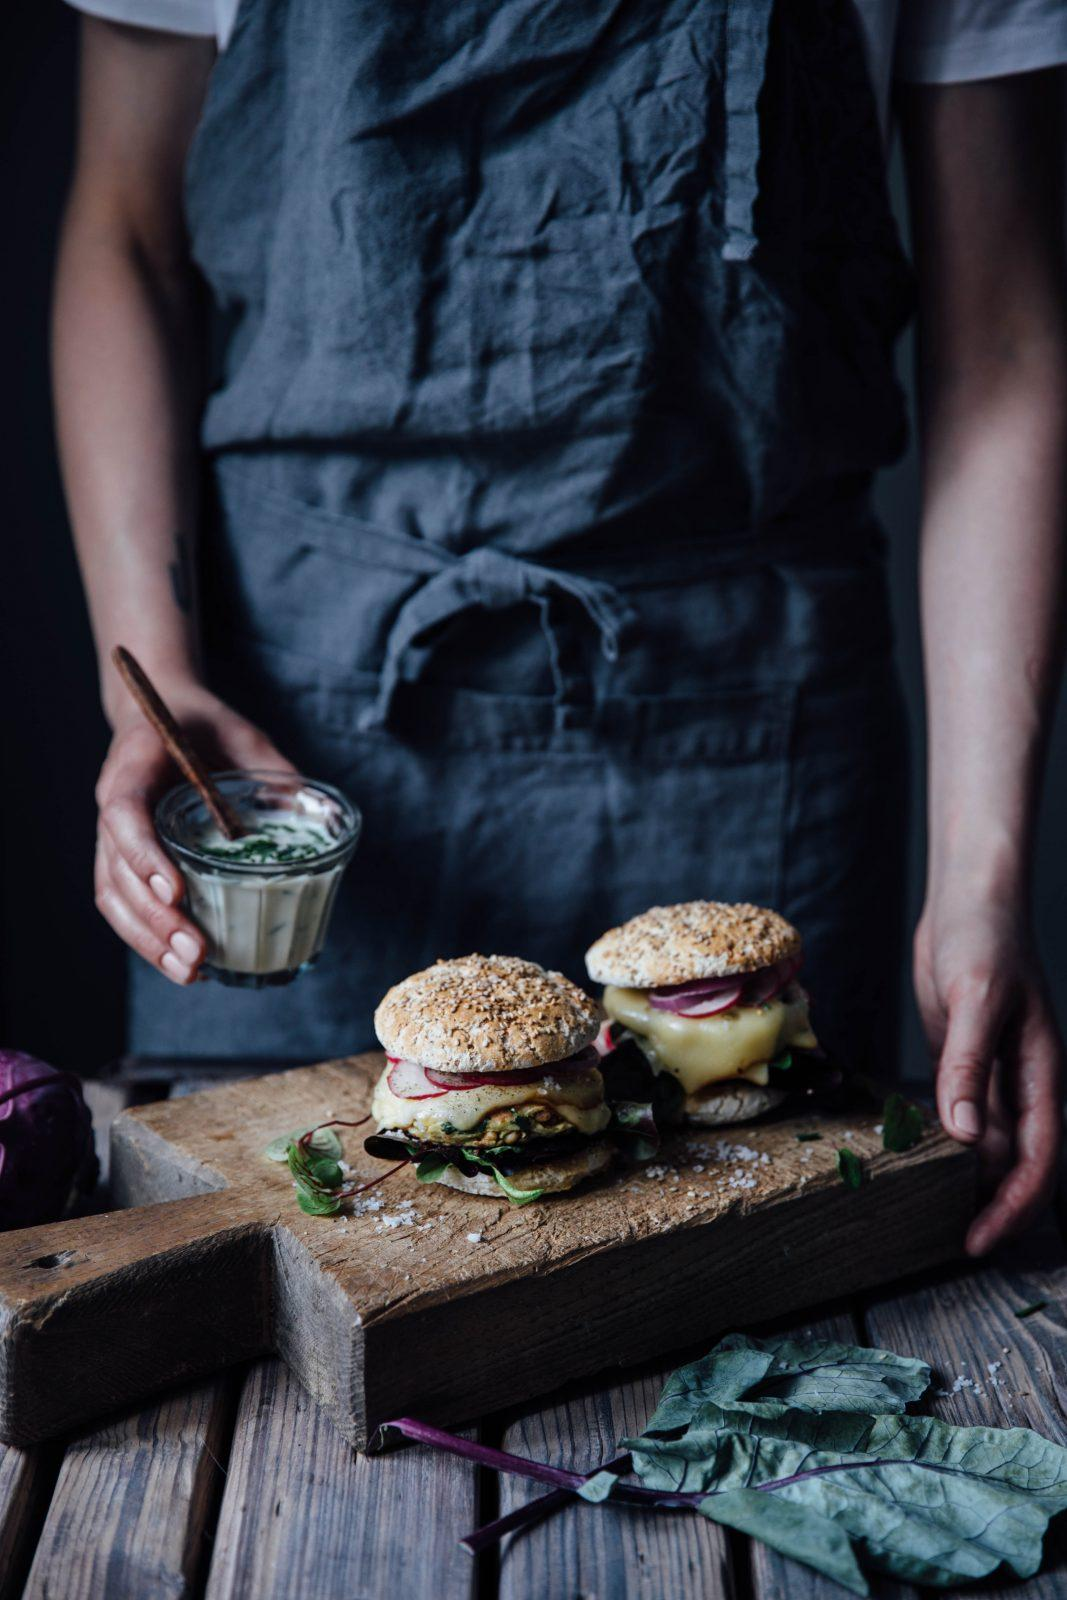 Gluten-free & Vegetarian Kohlrabi-Cheese Burgers